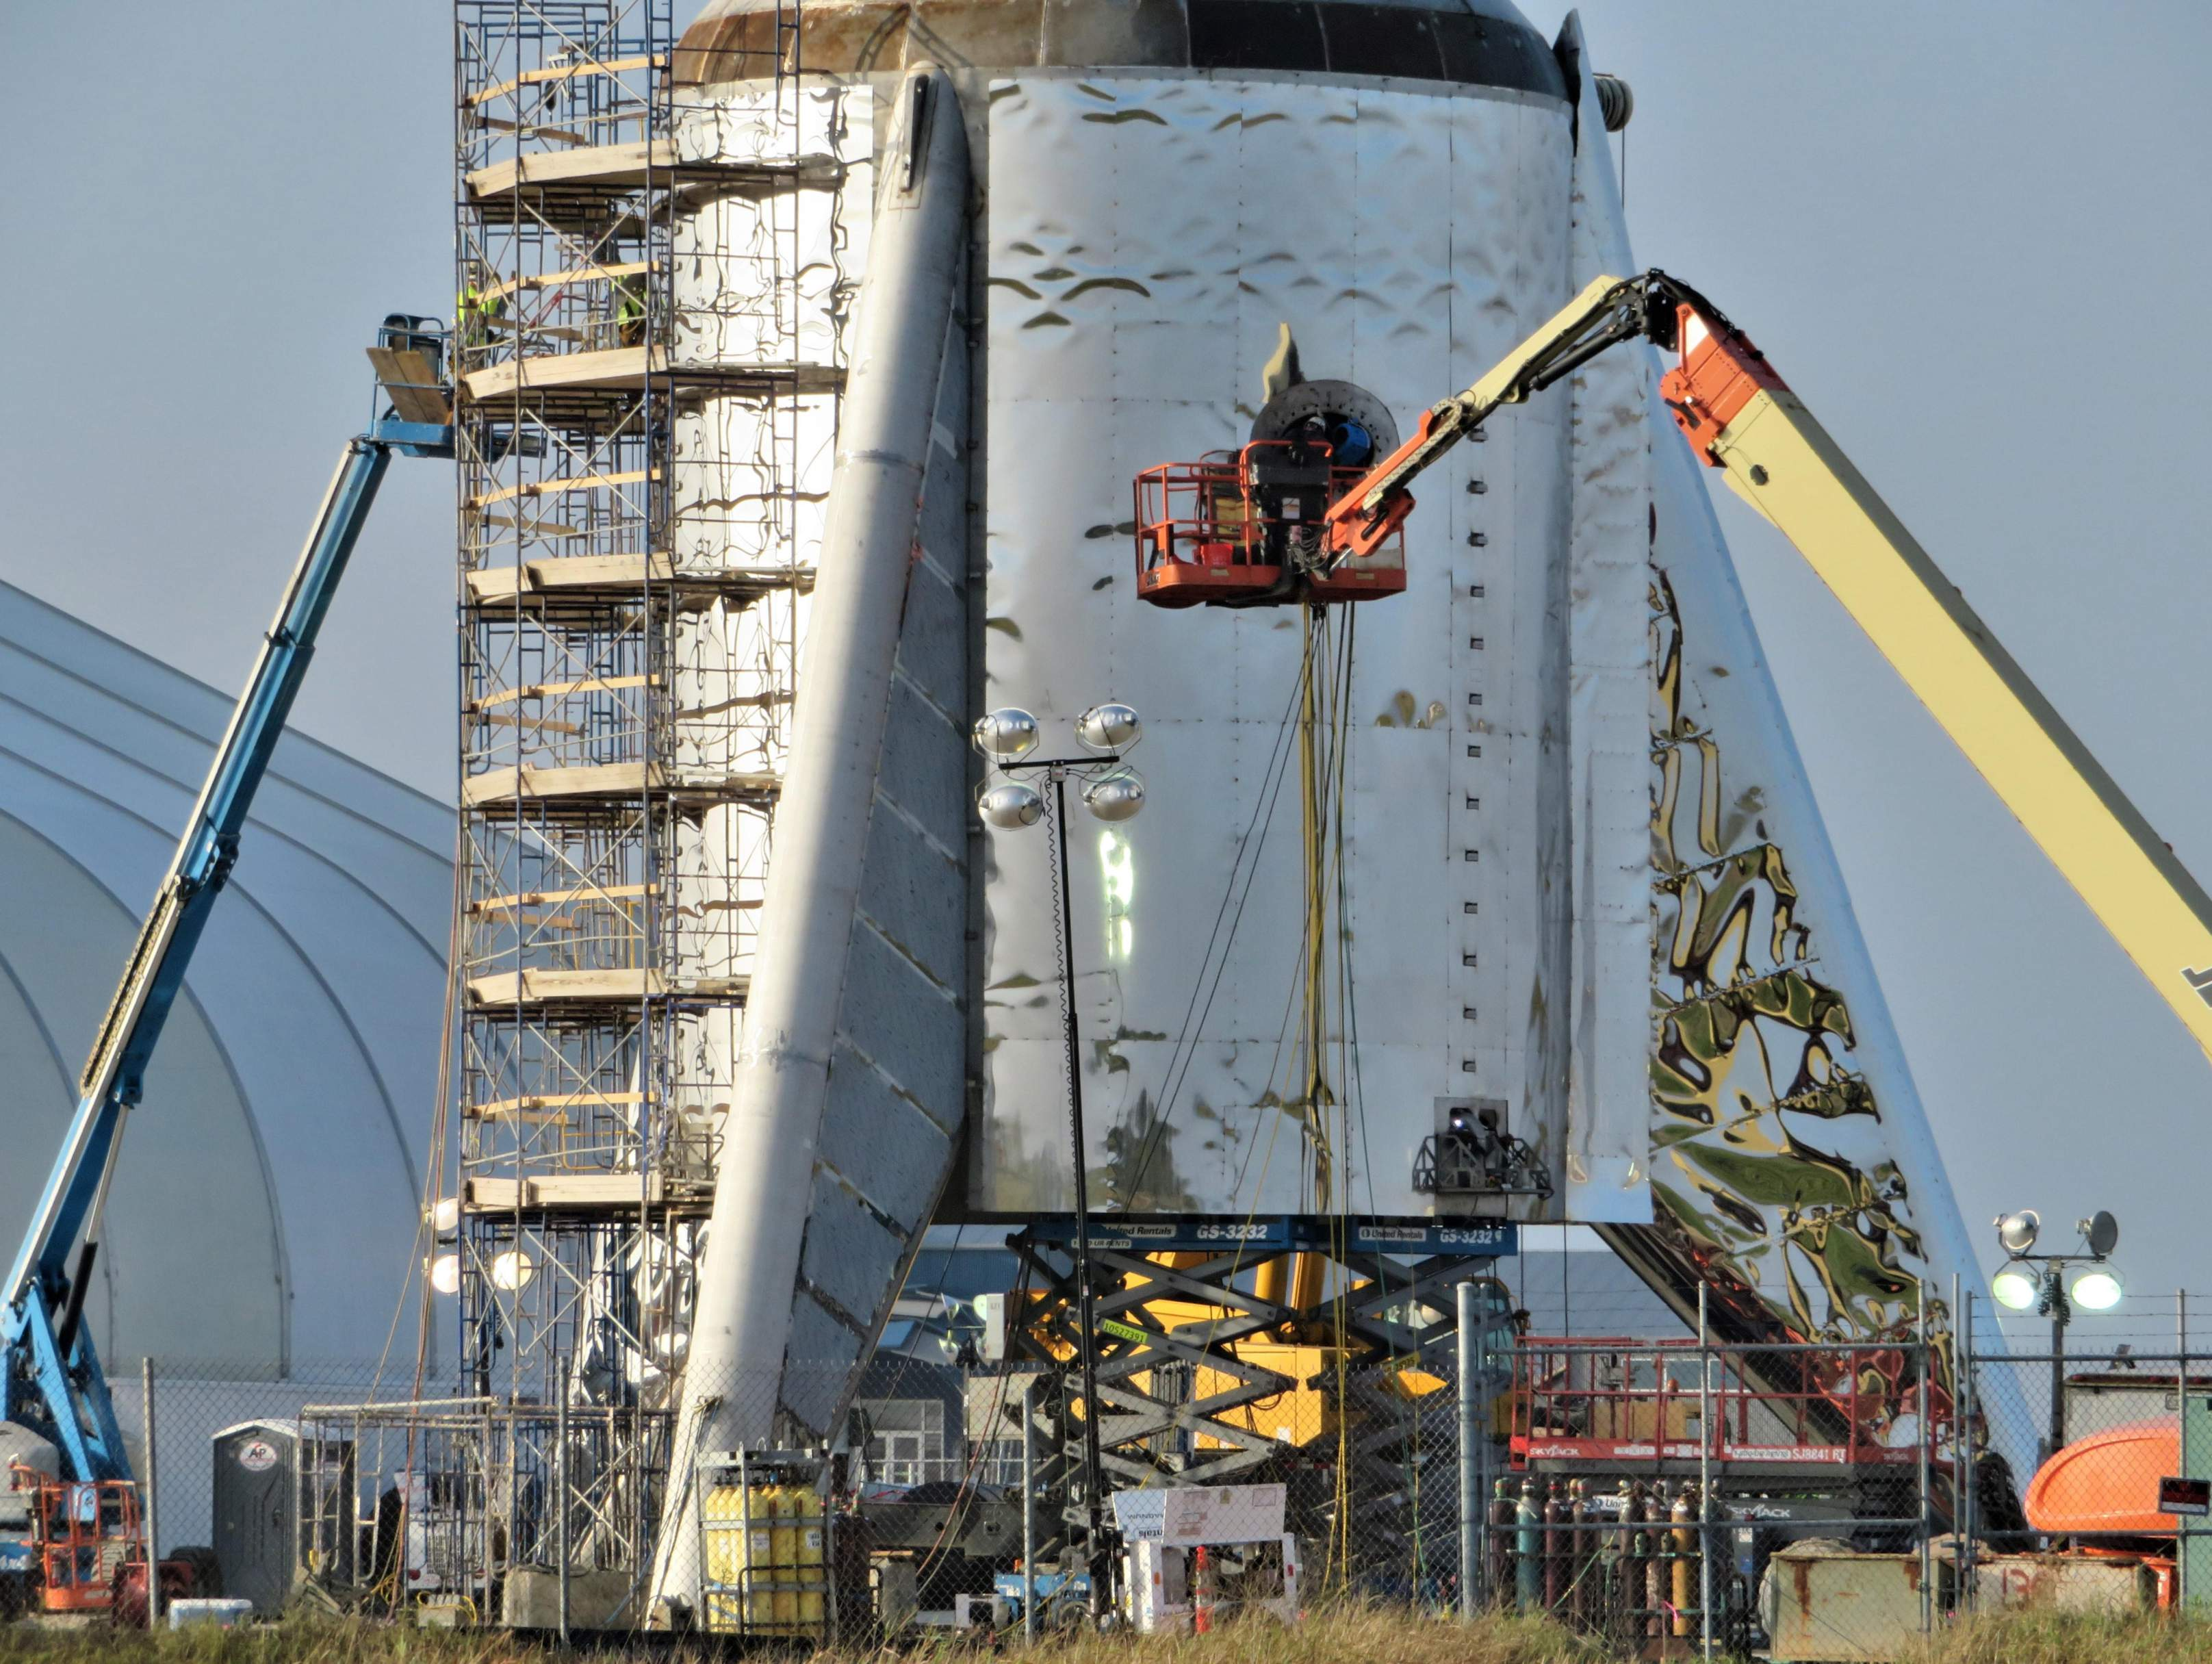 Boca Chica Starship progress 020519 (NASASpaceflight – bocachicagal) 1 (c)